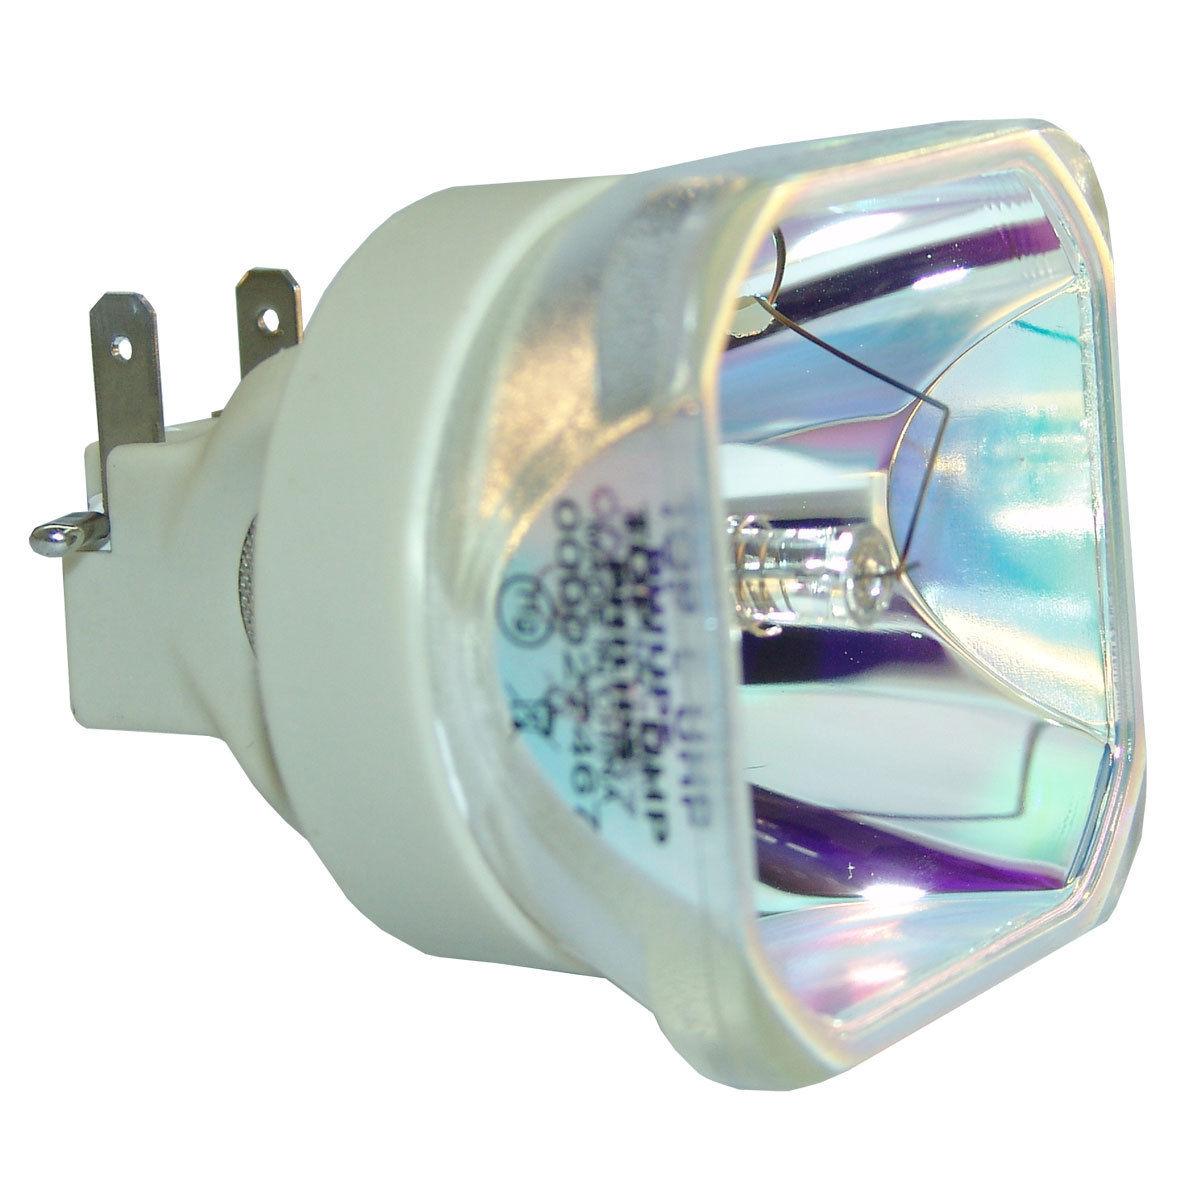 Compatible Bulb ET-LAV100 ETLAV100 for Panasonic PT-VX400 PT-VX400E PT-VX400EA PT-VW330  PT-VX400NT PT-VX41 Projector Lamp Bulb projector bulb et lab10 for panasonic pt lb10 pt lb10nt pt lb10nu pt lb10s pt lb20 with japan phoenix original lamp burner